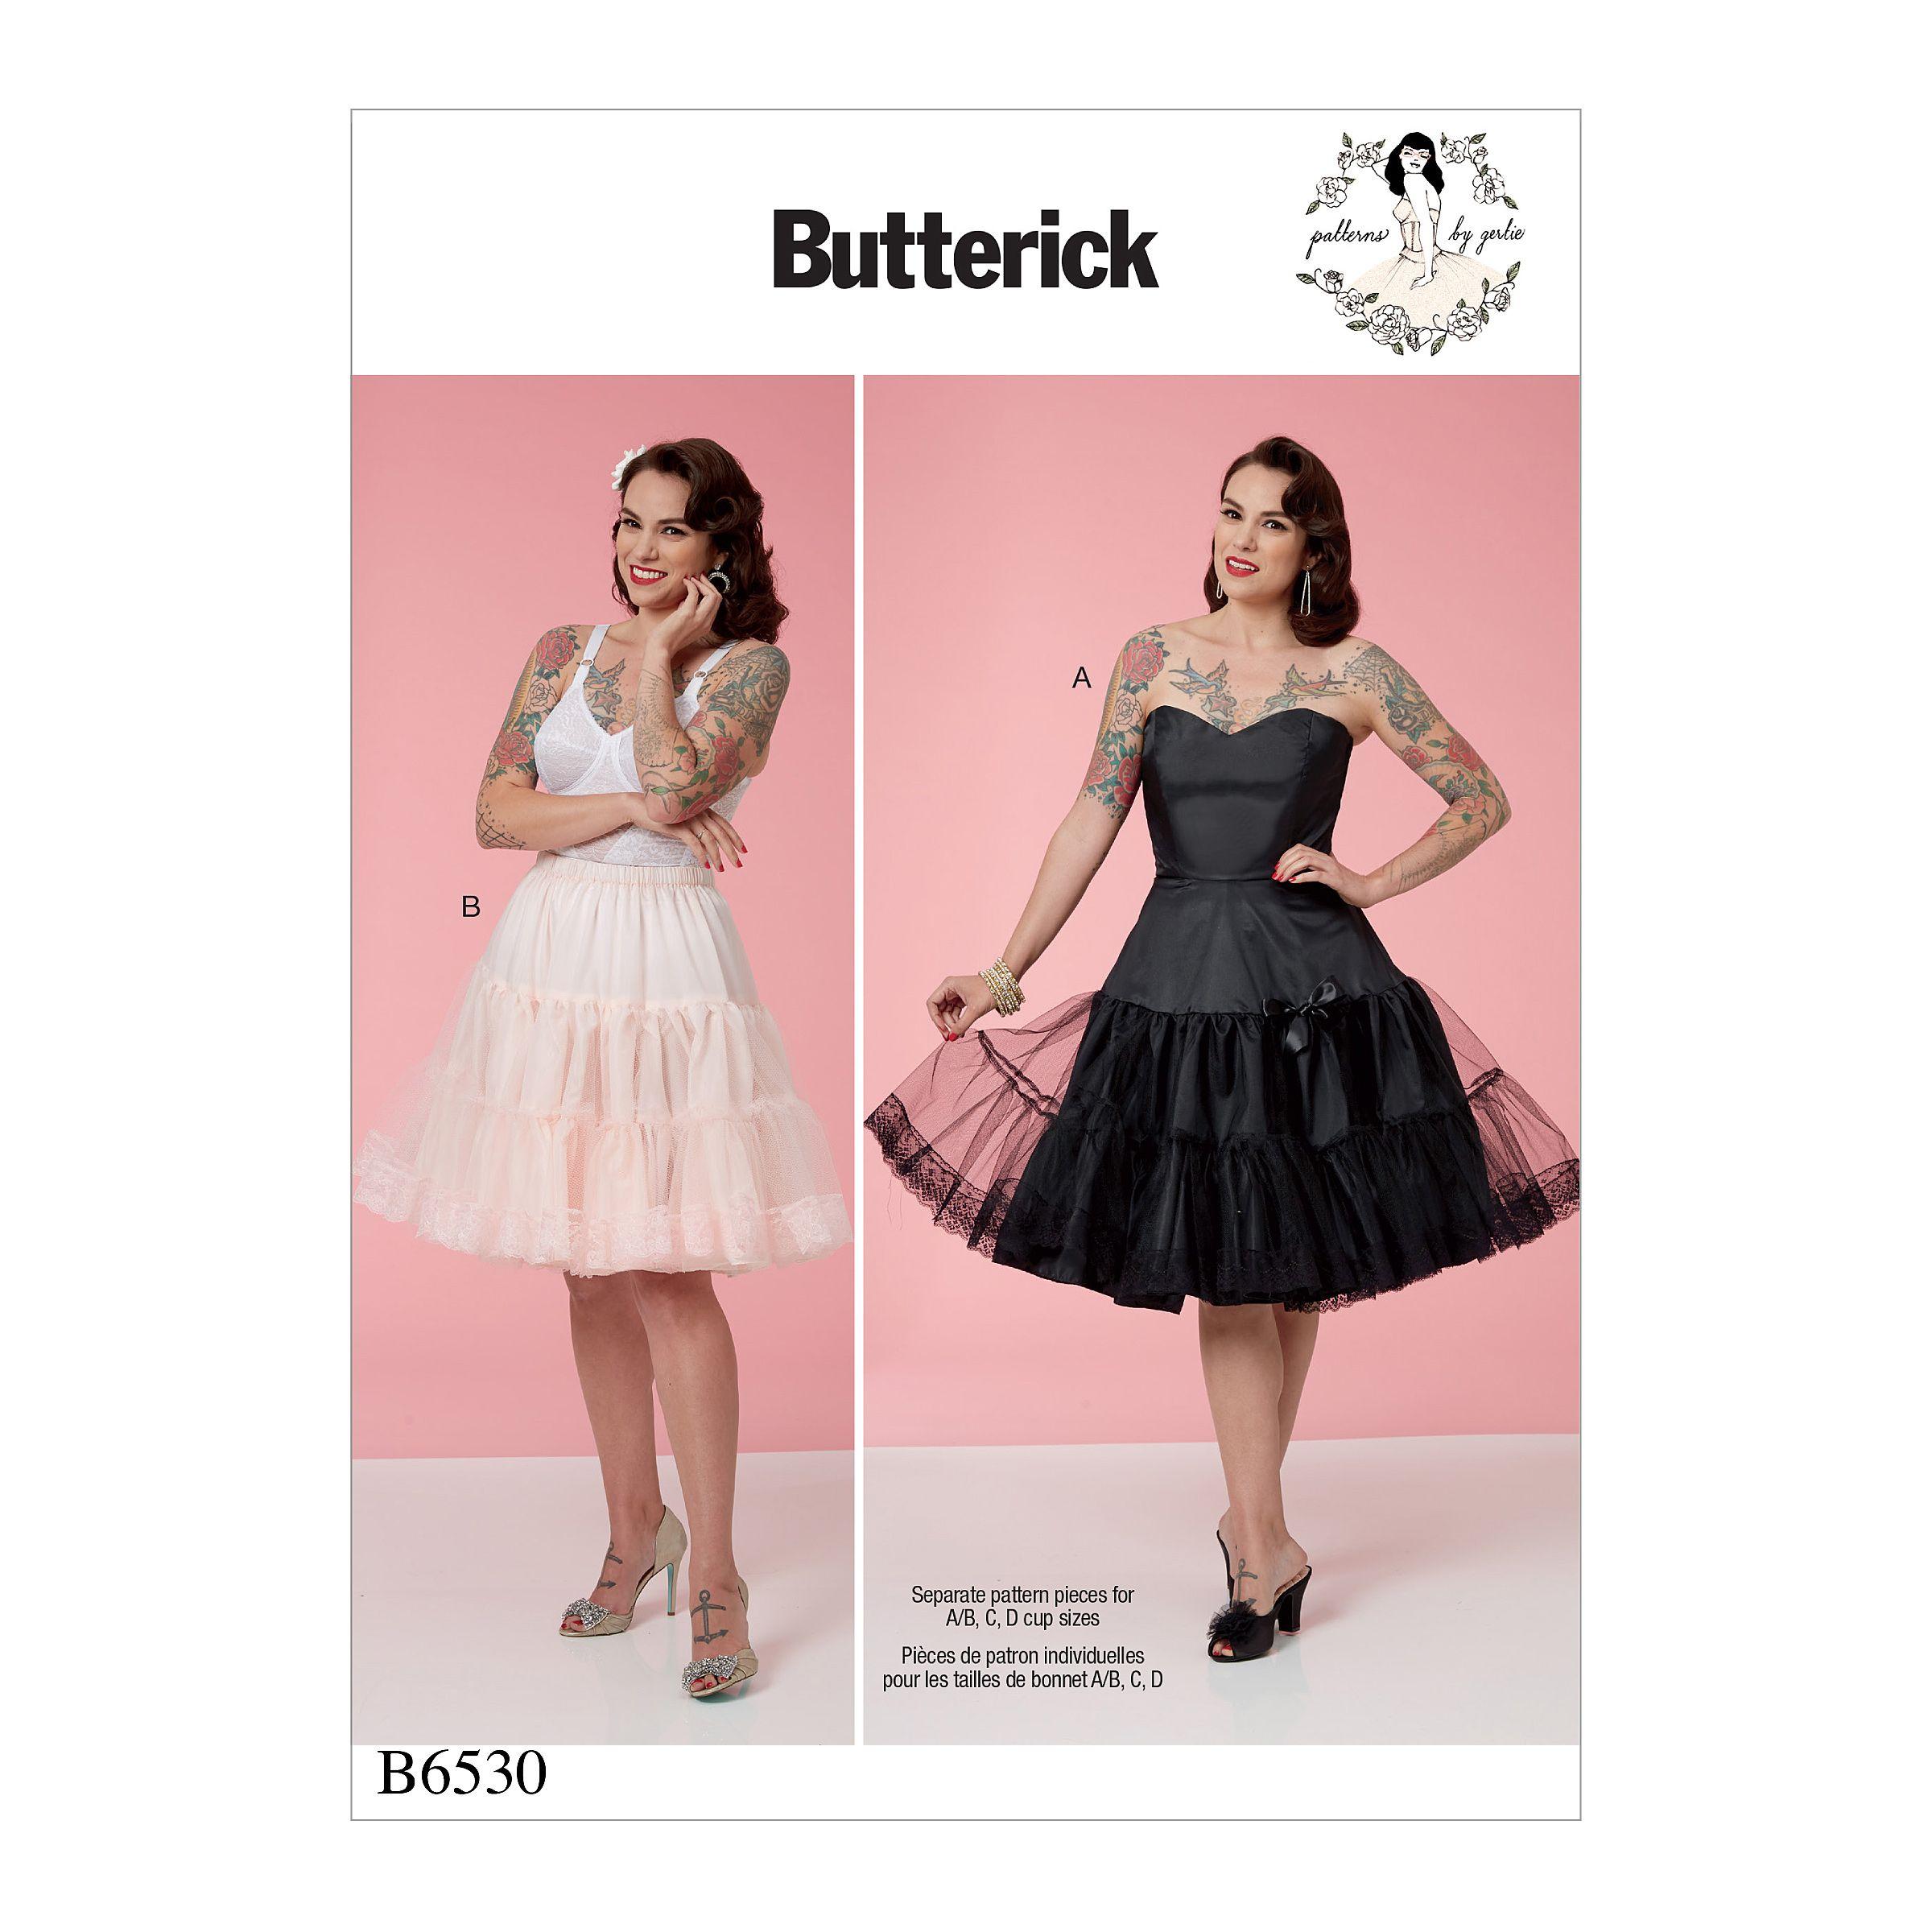 B6530 Sewing Pattern Butterick 6530 Misses/' Full Slip Petticoat Pin Up Gertie